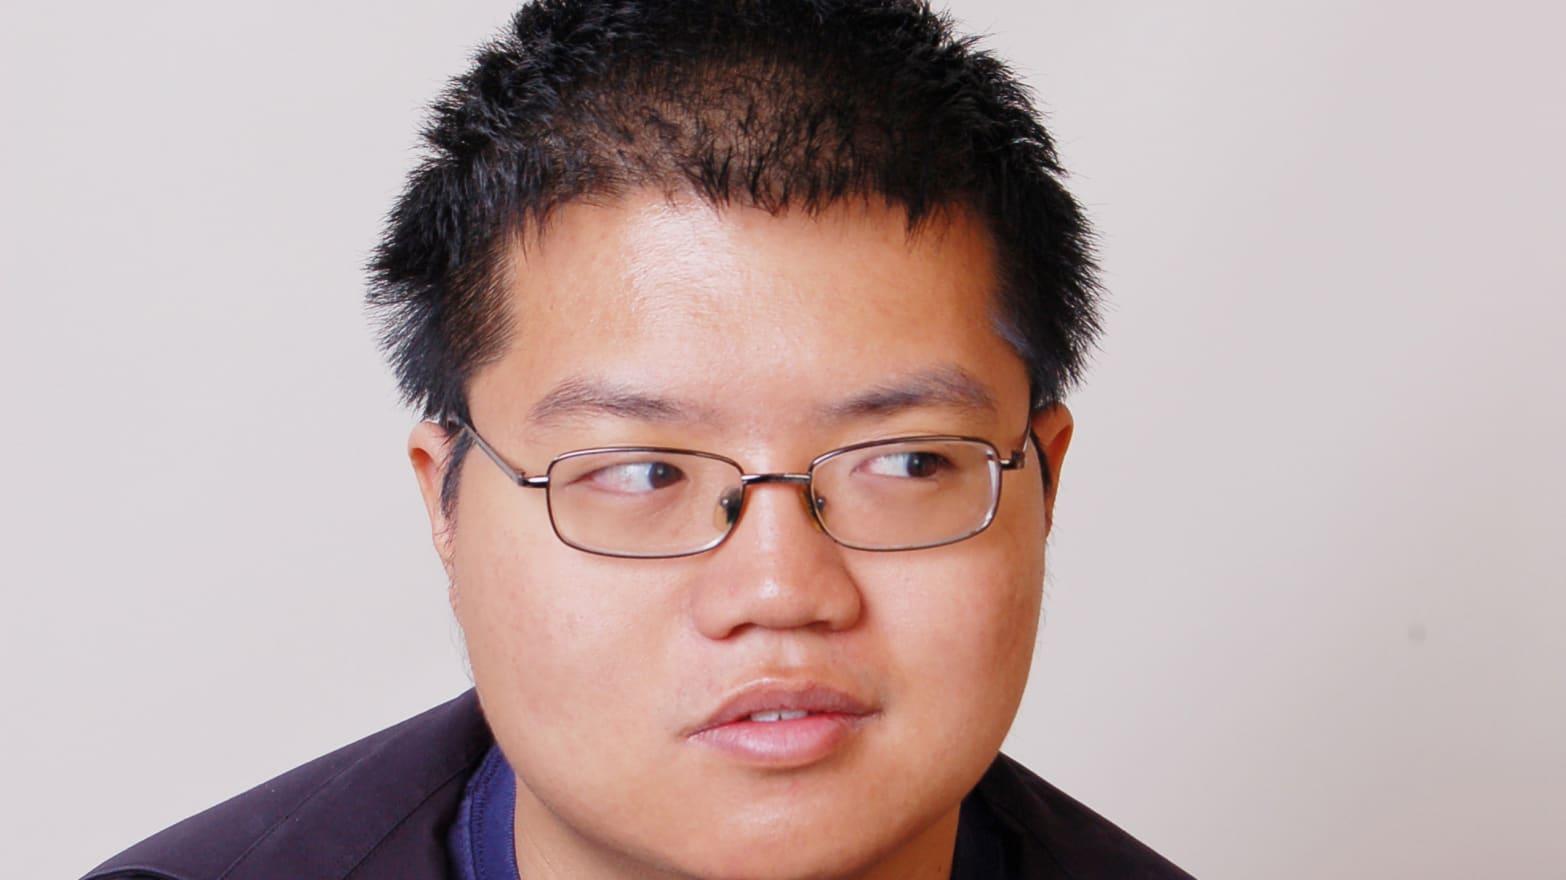 Inside the Misunderstood Mind of Jeopardy! Champ Arthur Chu